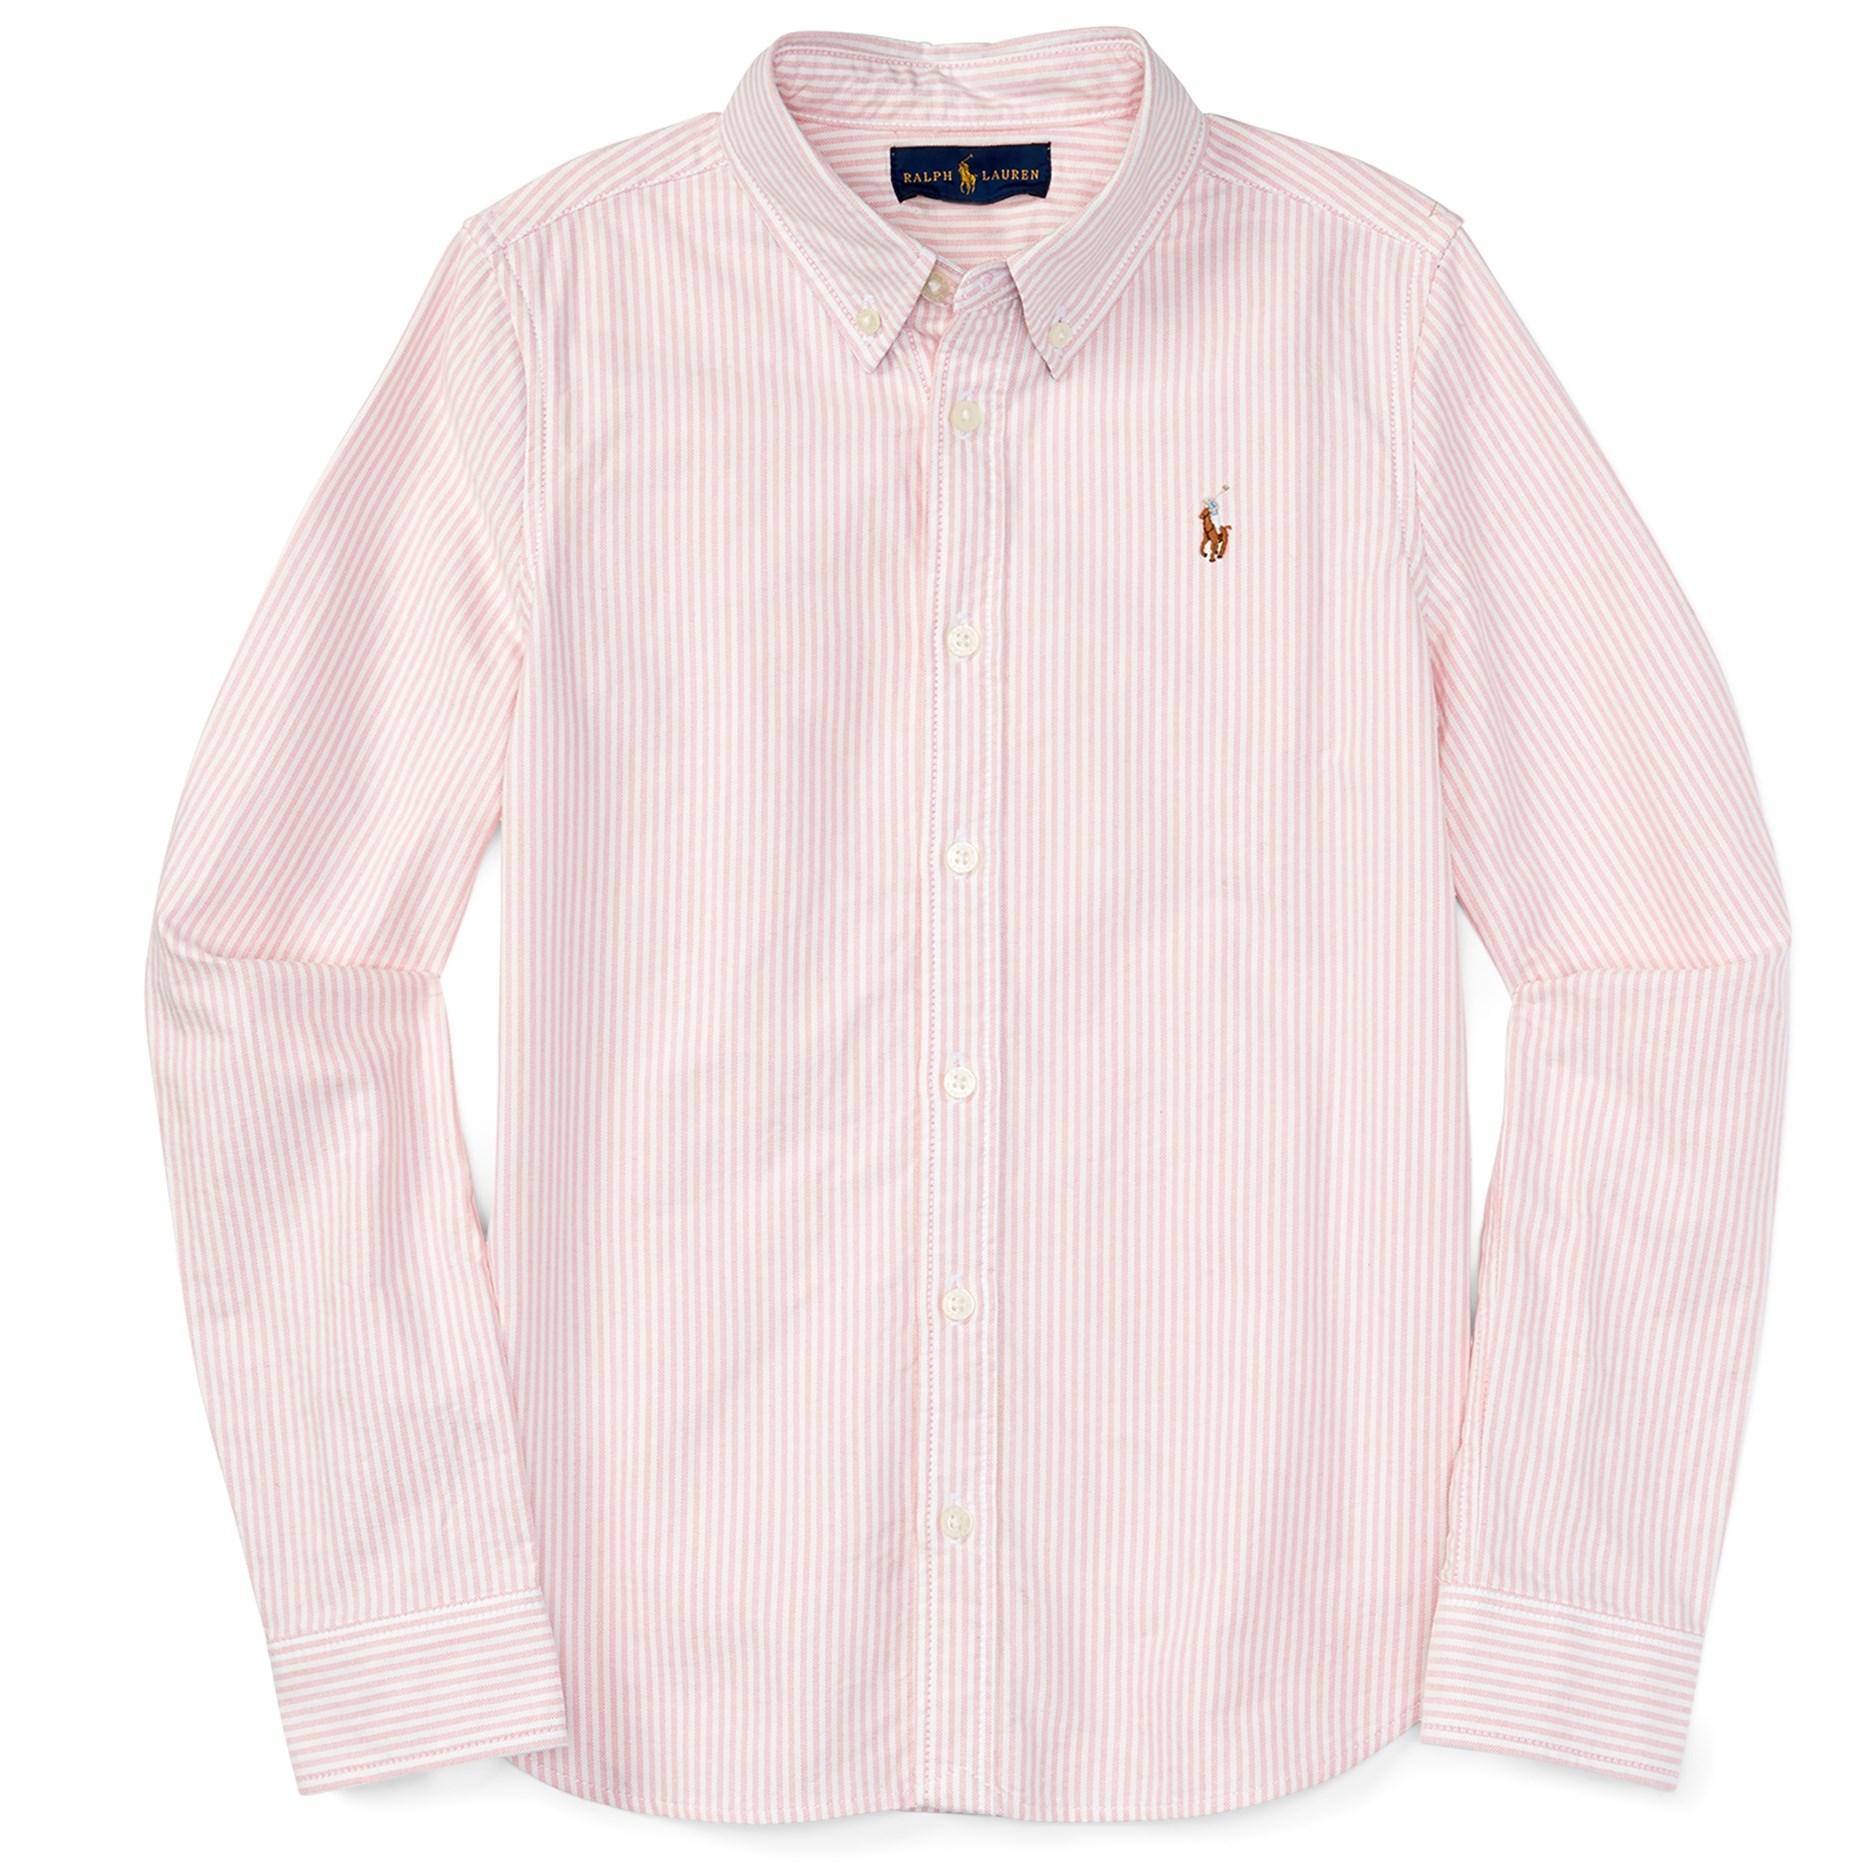 c7fb9c3a7 Polo Ralph Lauren Girl Long Sleeved Stripe Oxford Shirt Pink White